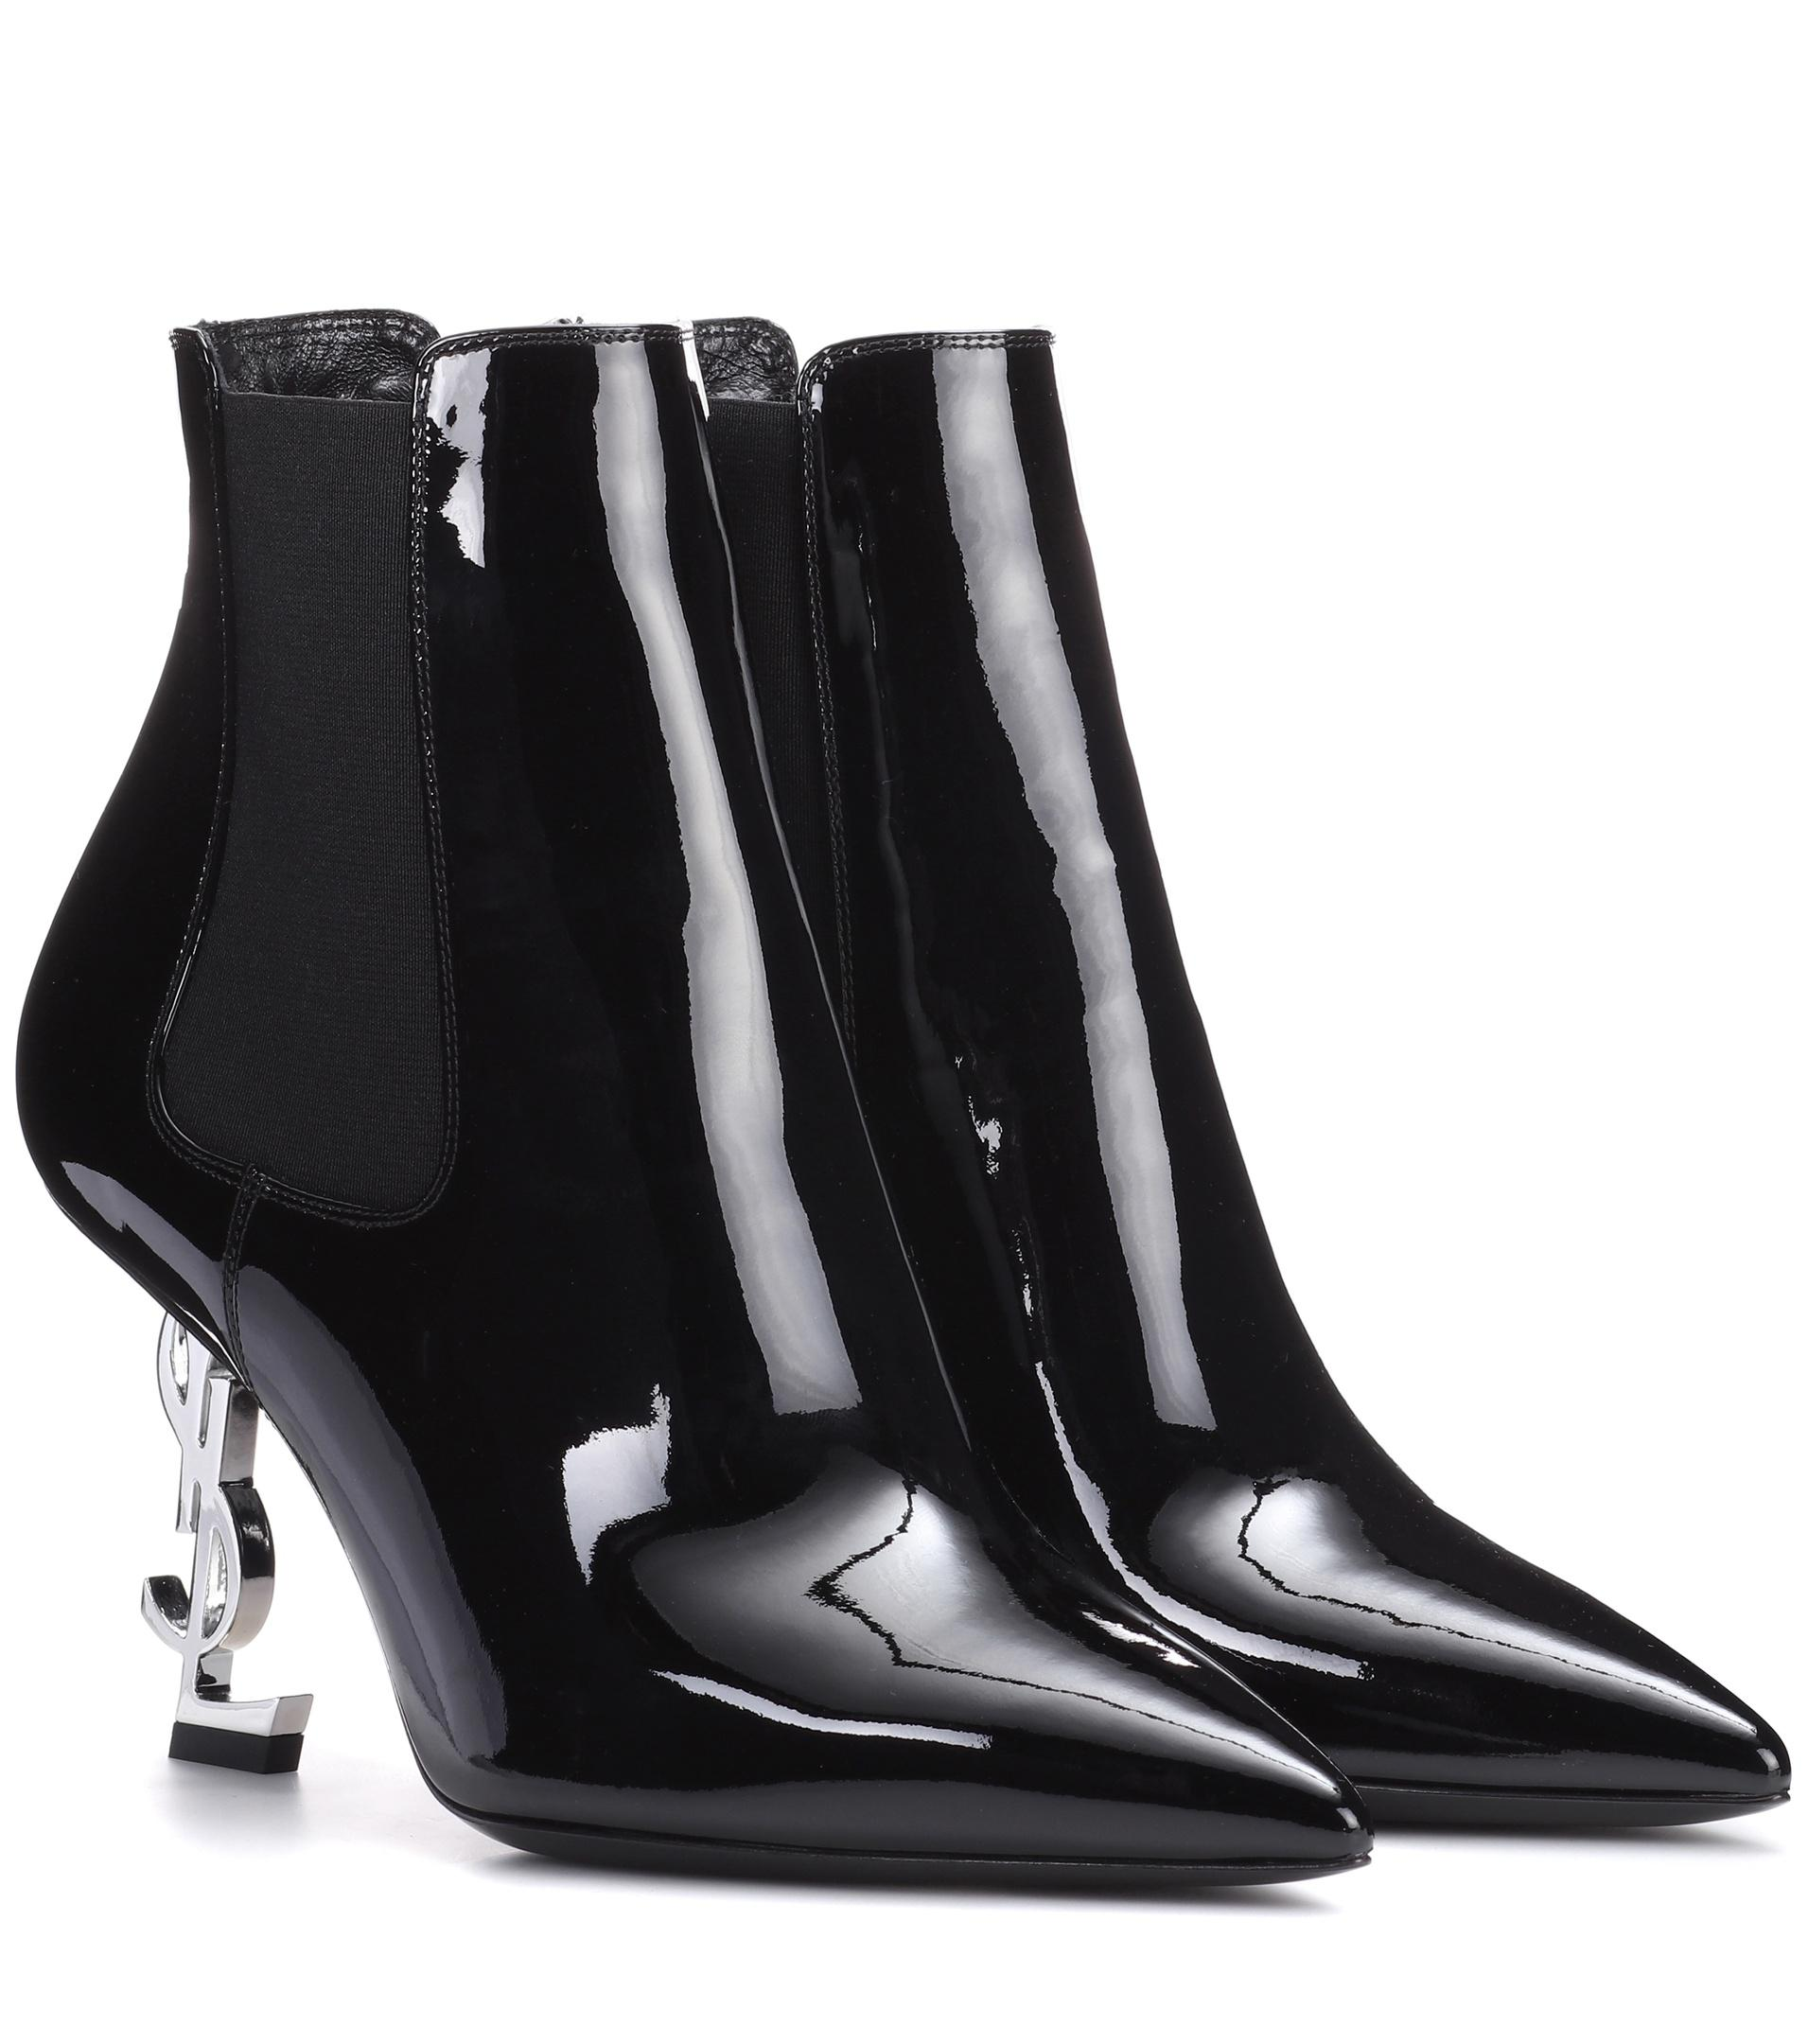 242f0a80f9b Saint Laurent Opyum Patent Booties With Monogram Ysl Heel in Black ...